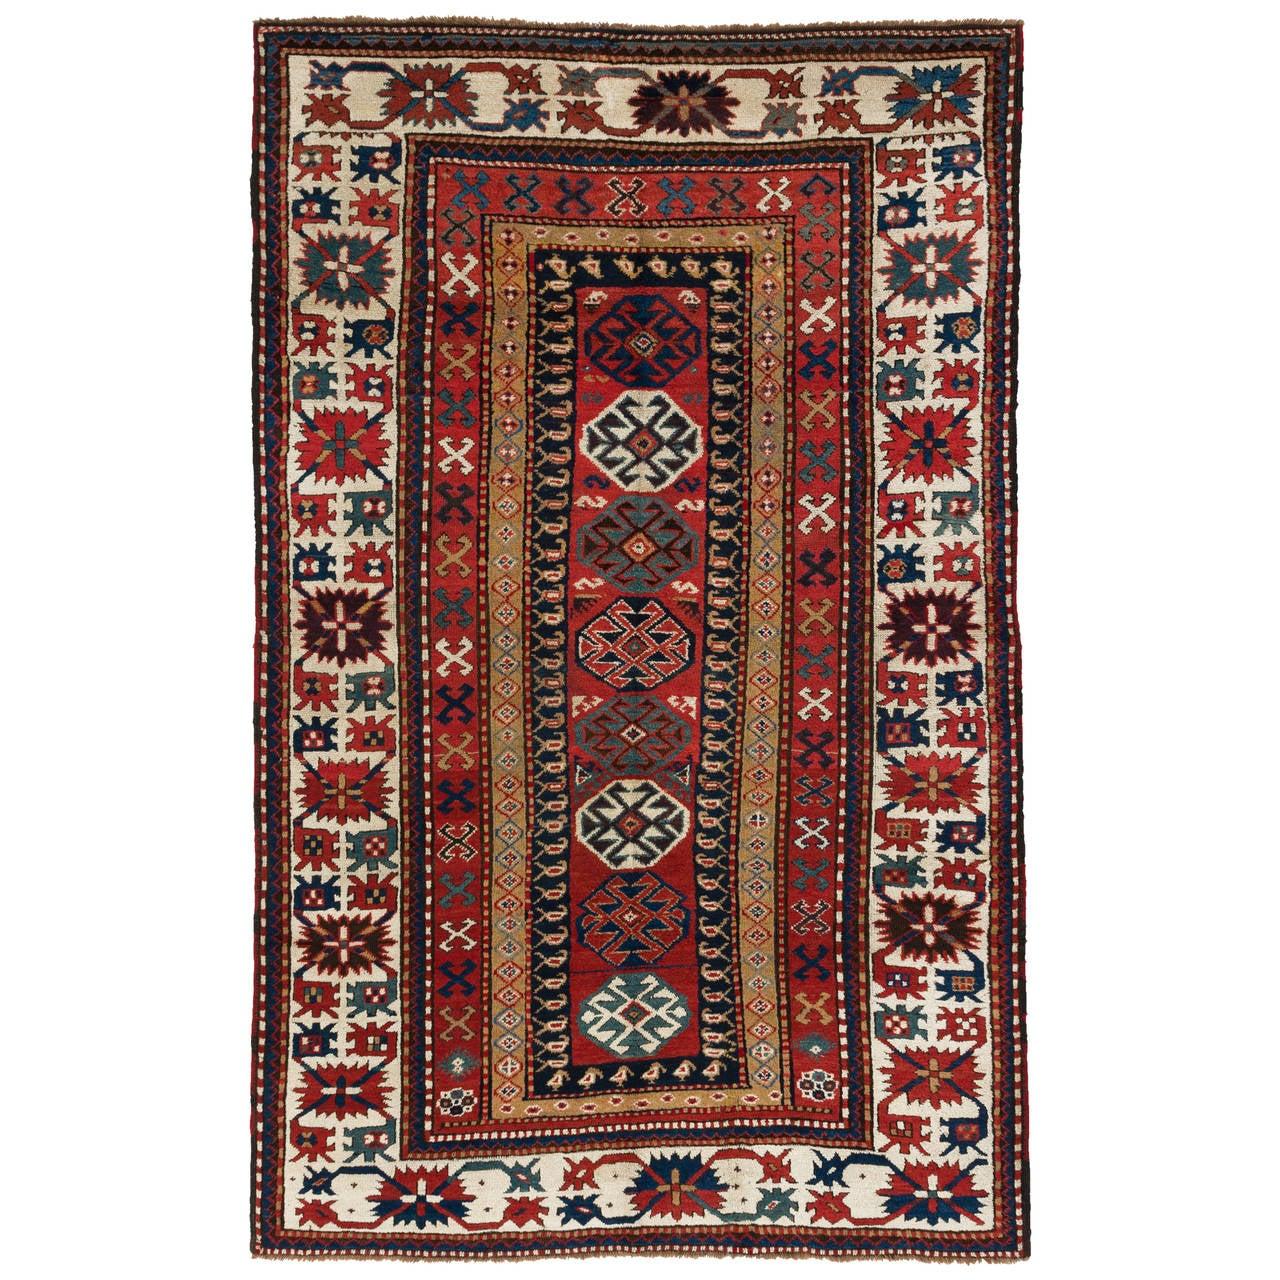 Antique Caucasian Kazak Rug, 19th Century For Sale At 1stdibs